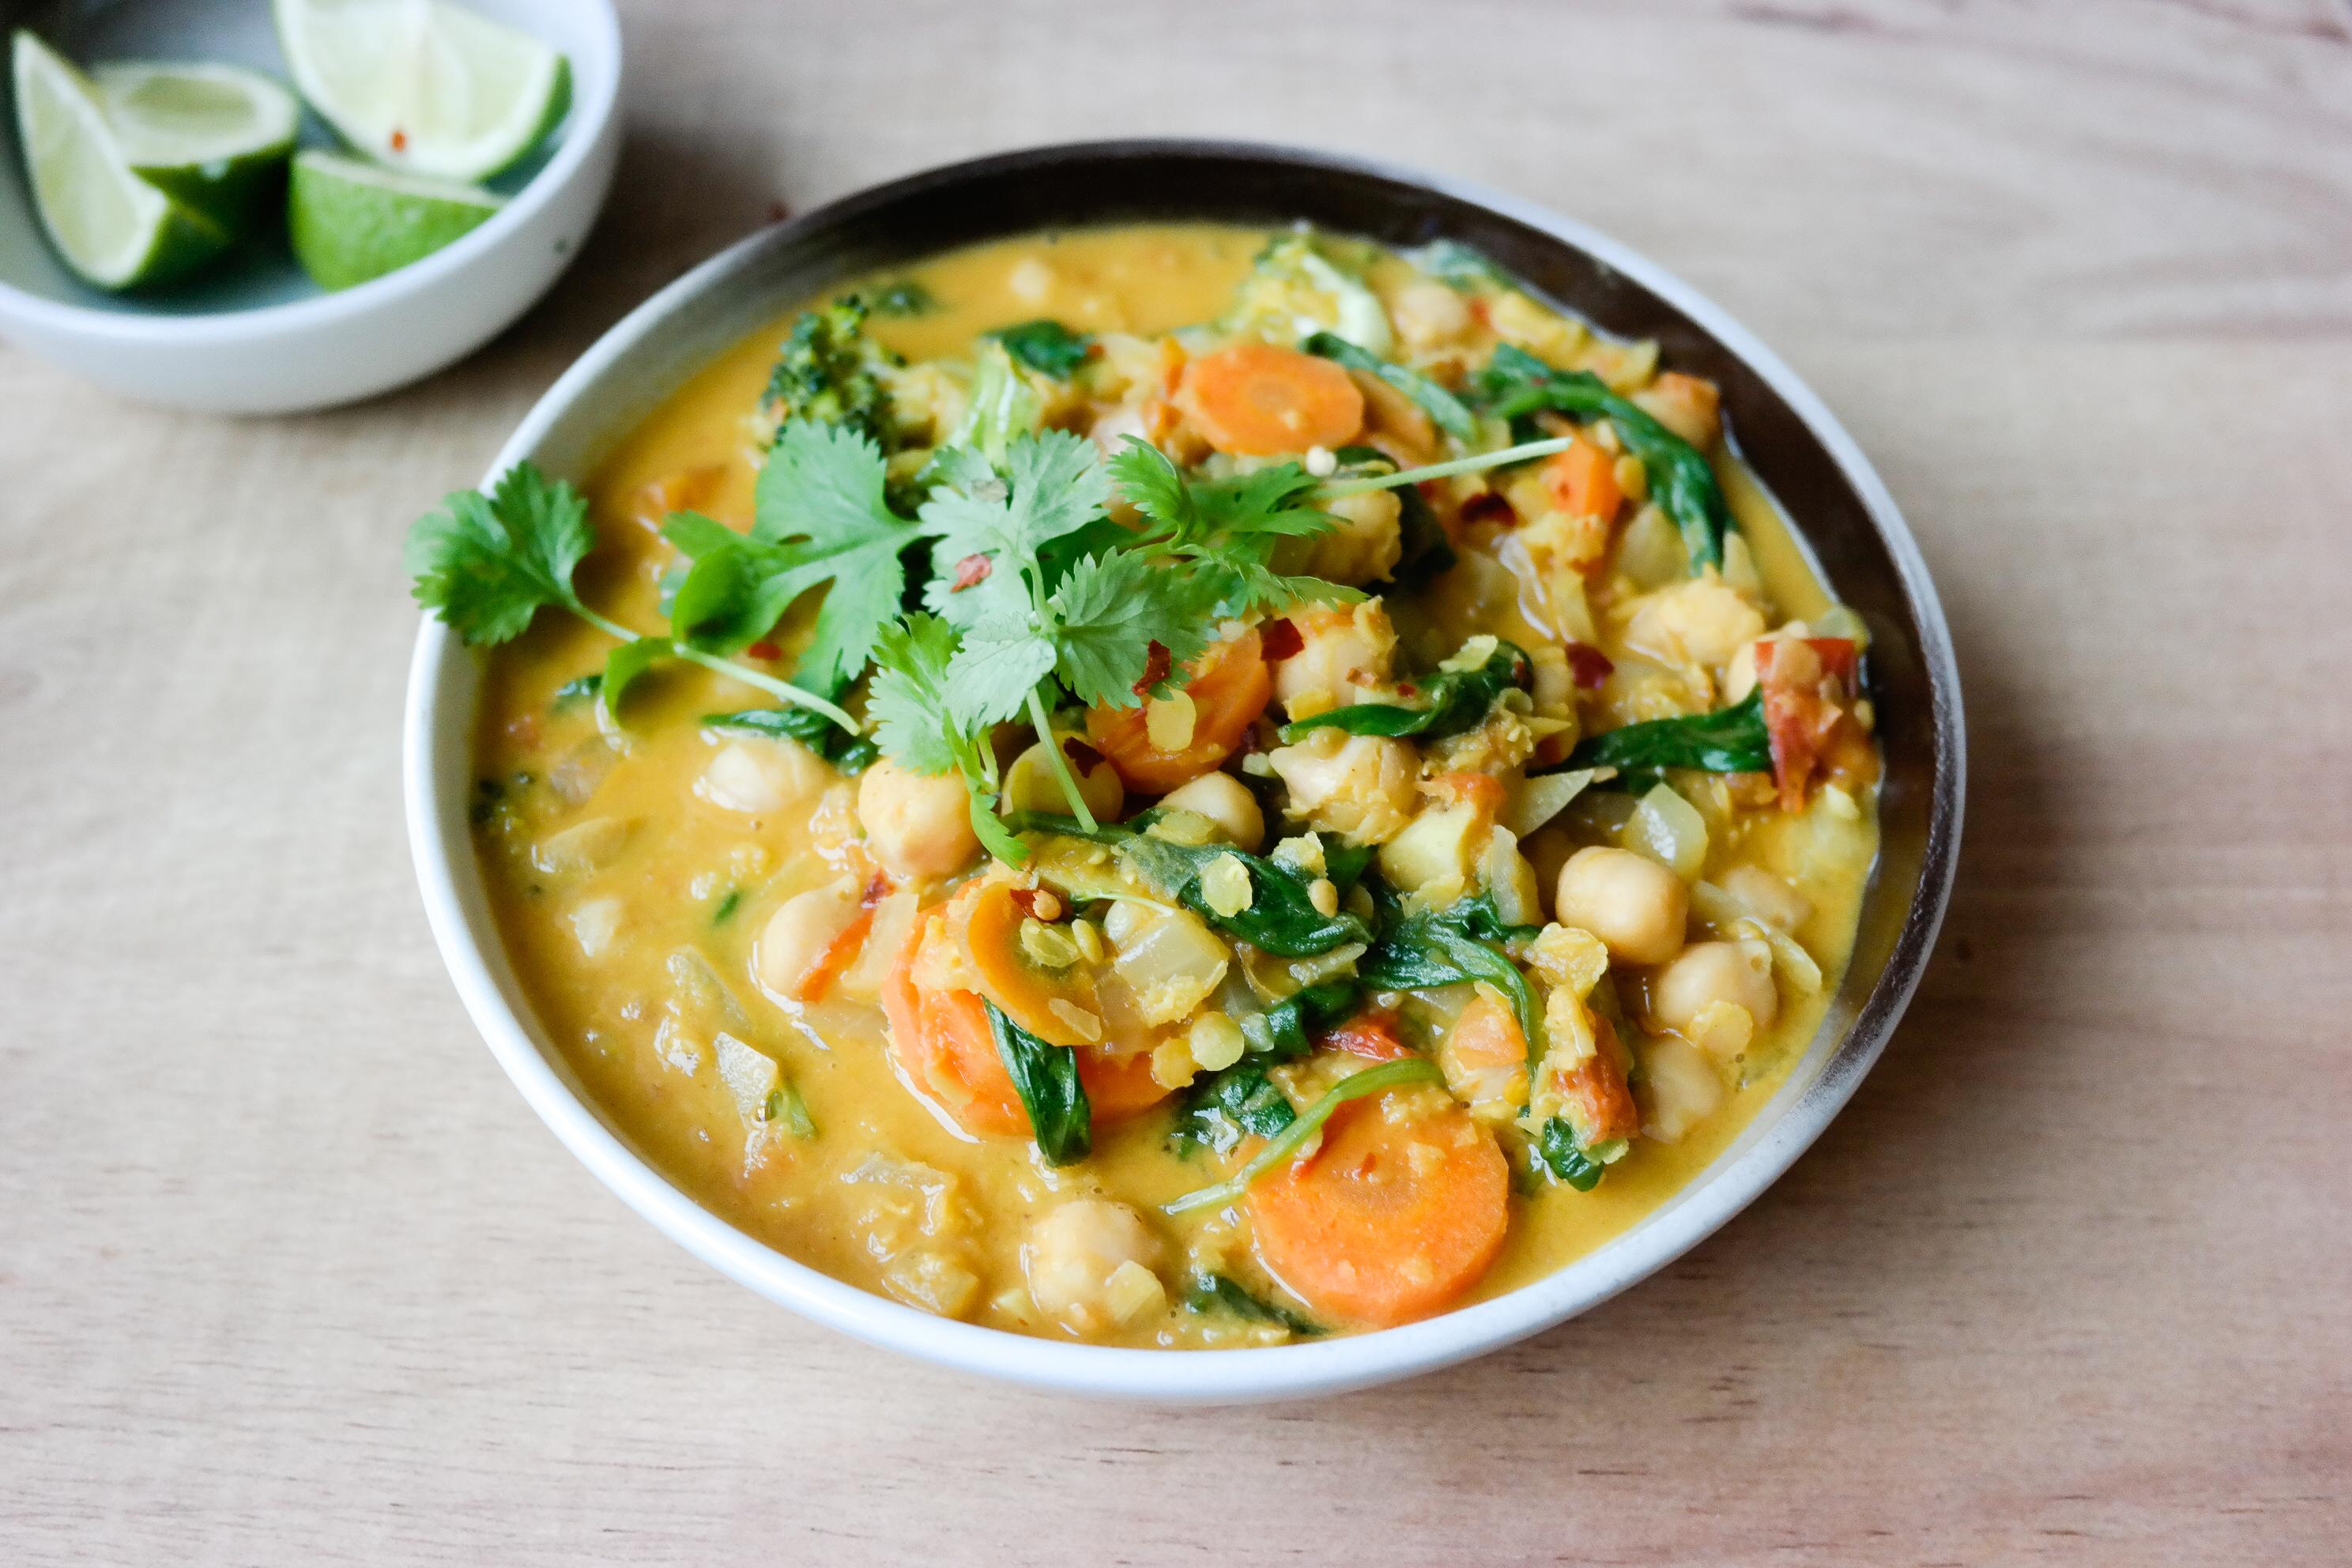 Jasså, det regner, sier du? Currygryte med kikerter og spinat, da.